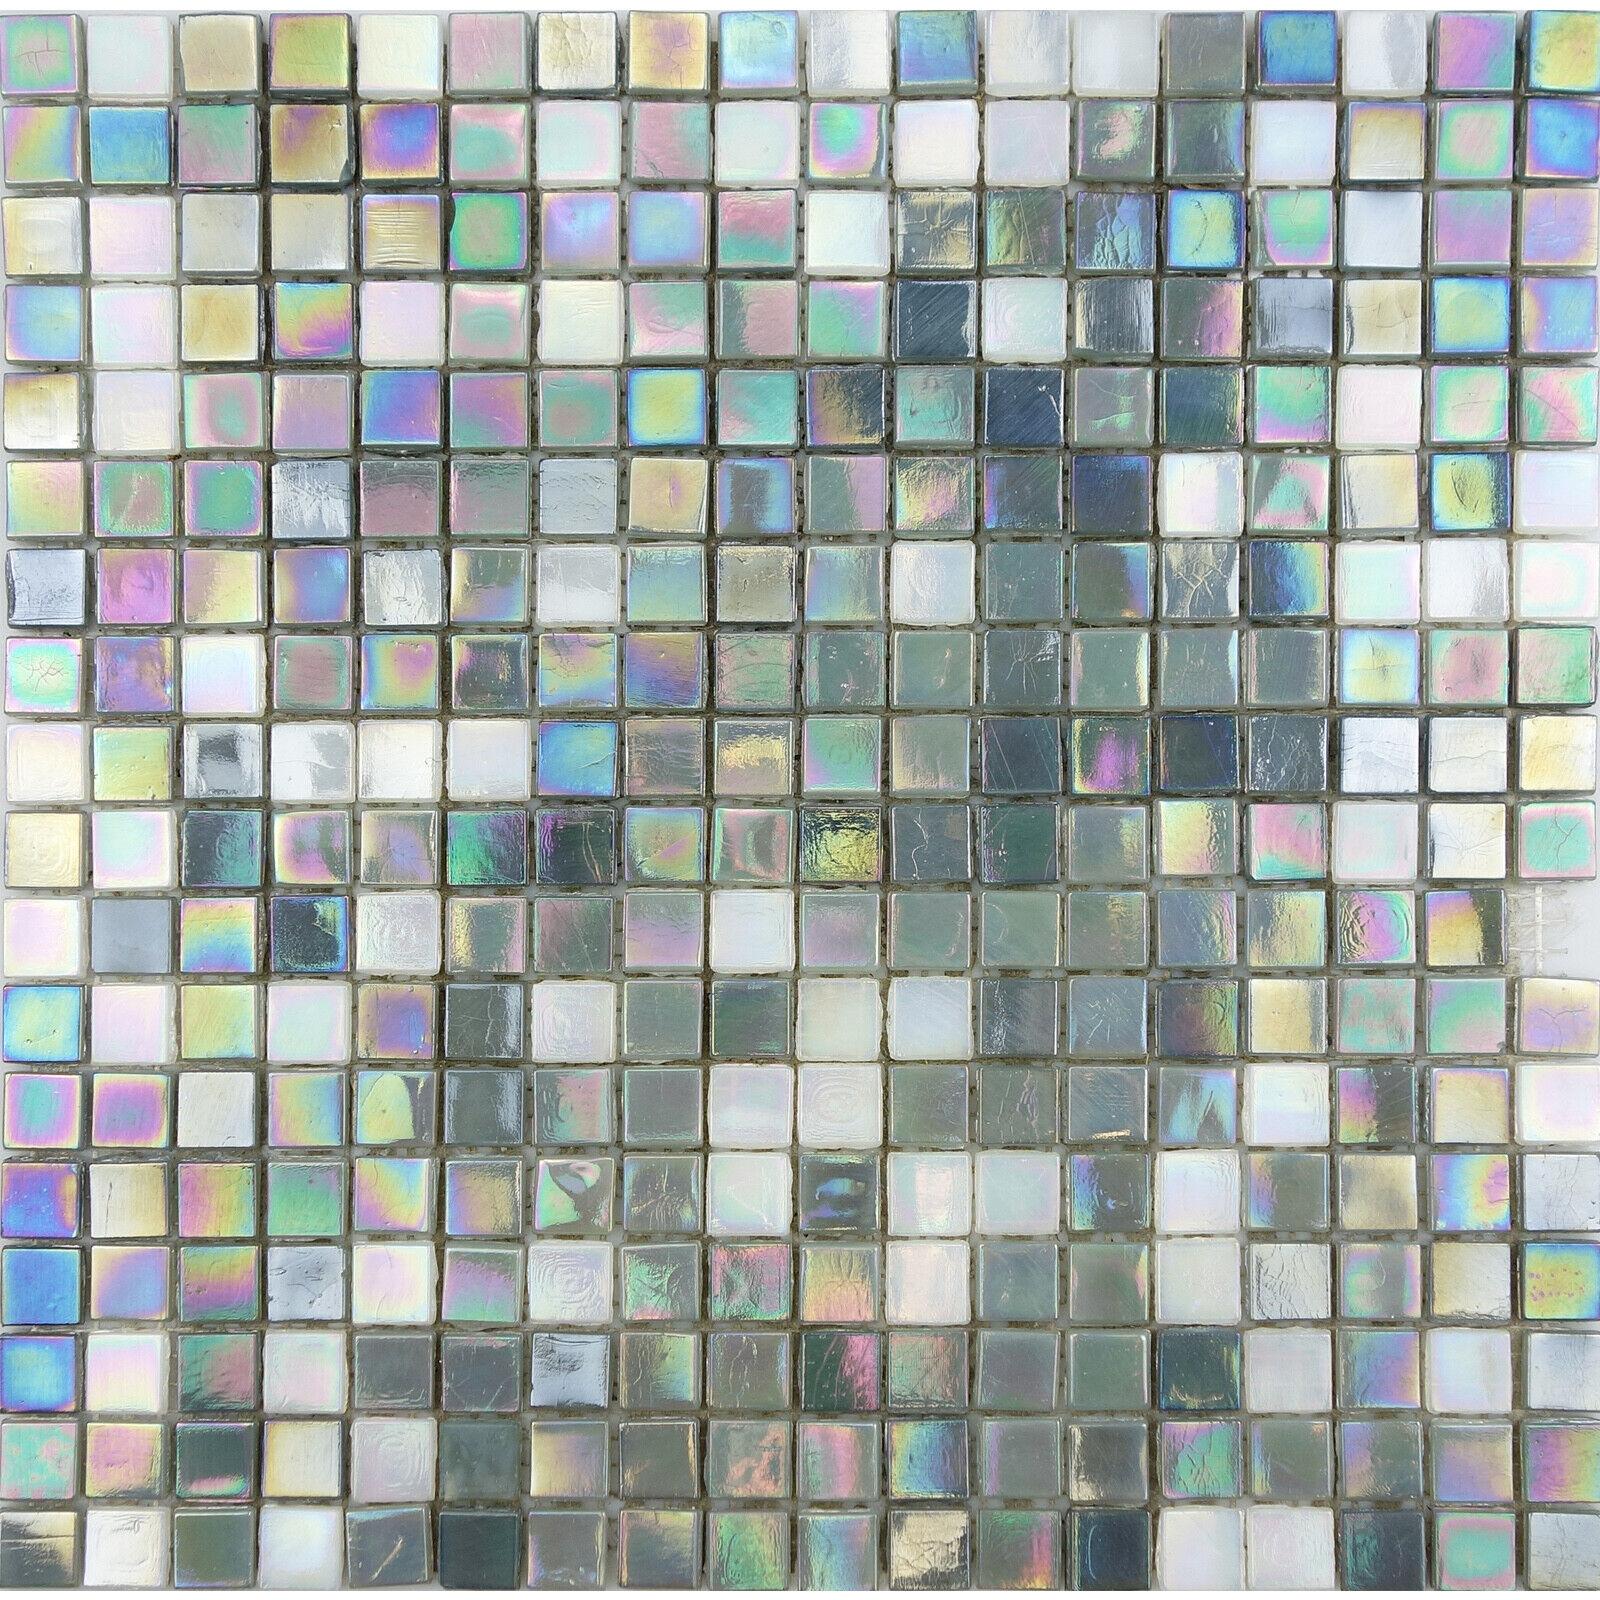 Sweet Purple Iridescent Glass Tile Mosaic Tiles Kitchen Backsplash Bath Pool For Sale Online Ebay